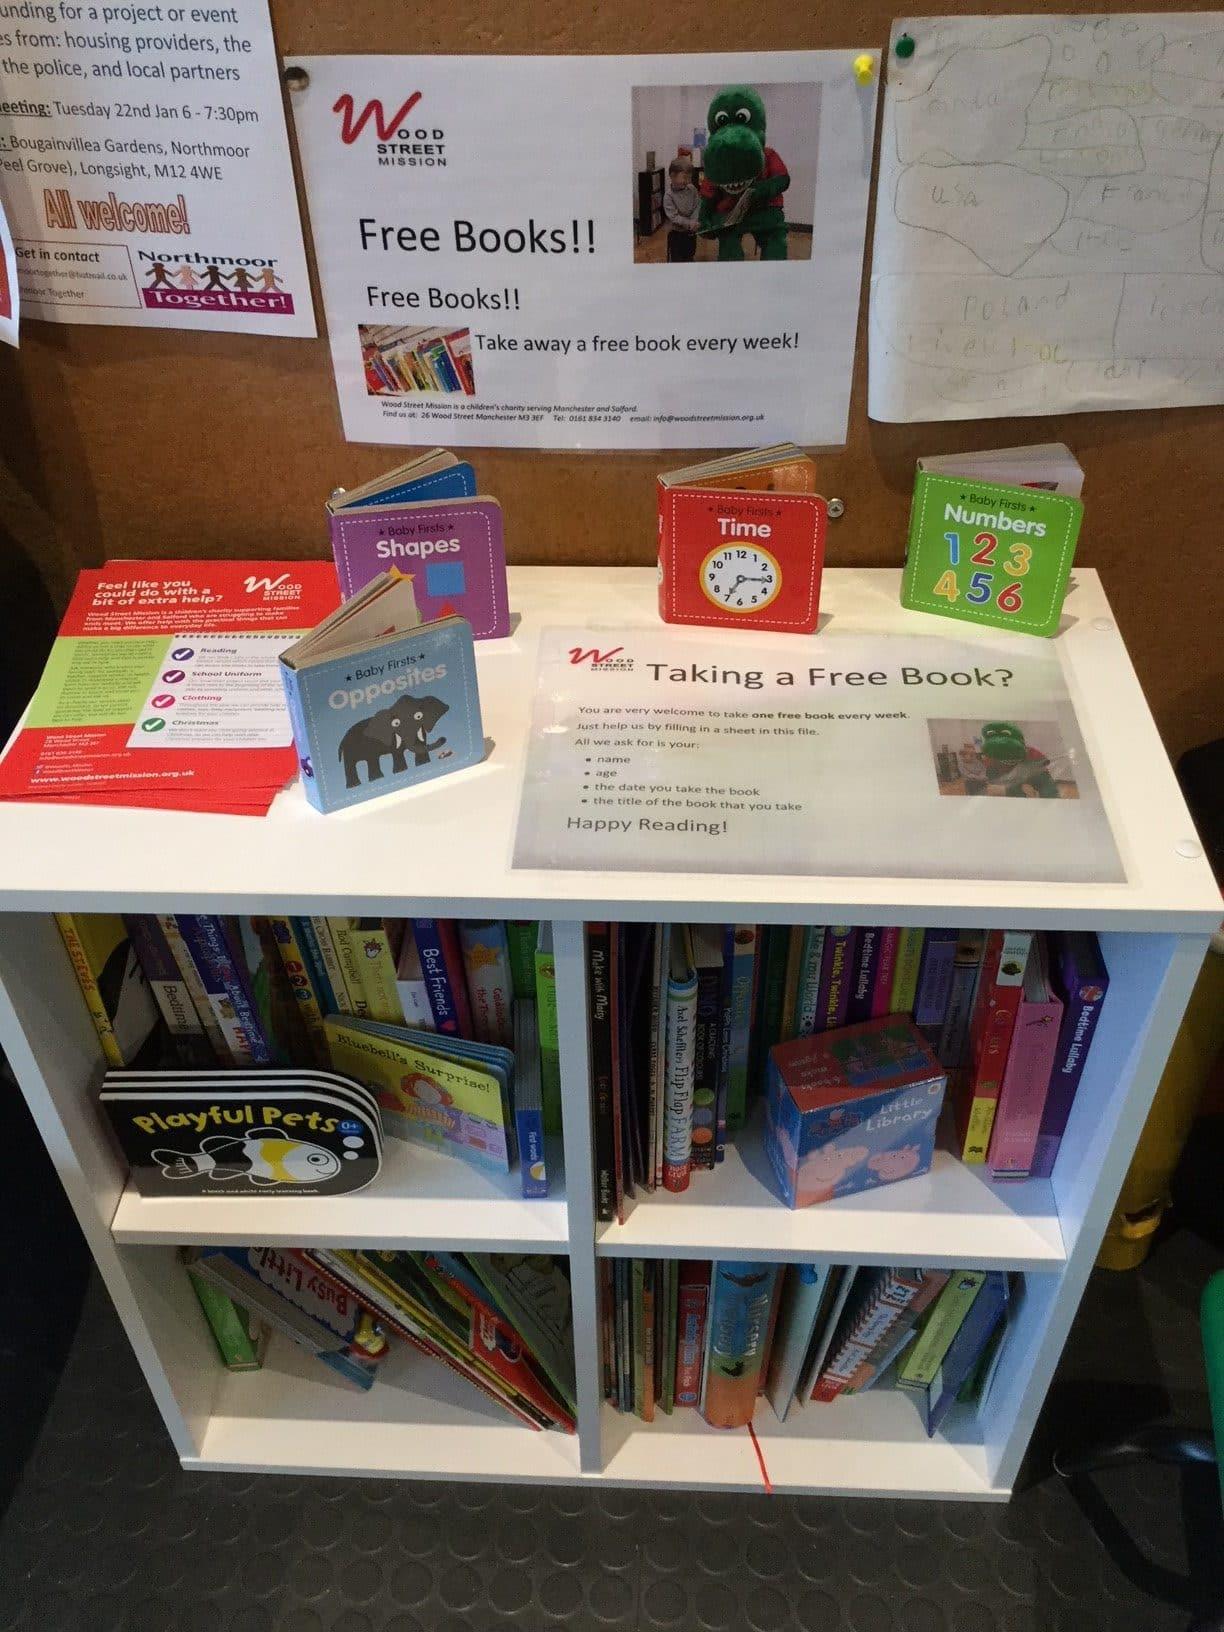 Free books for children! – Northmoor Community Association